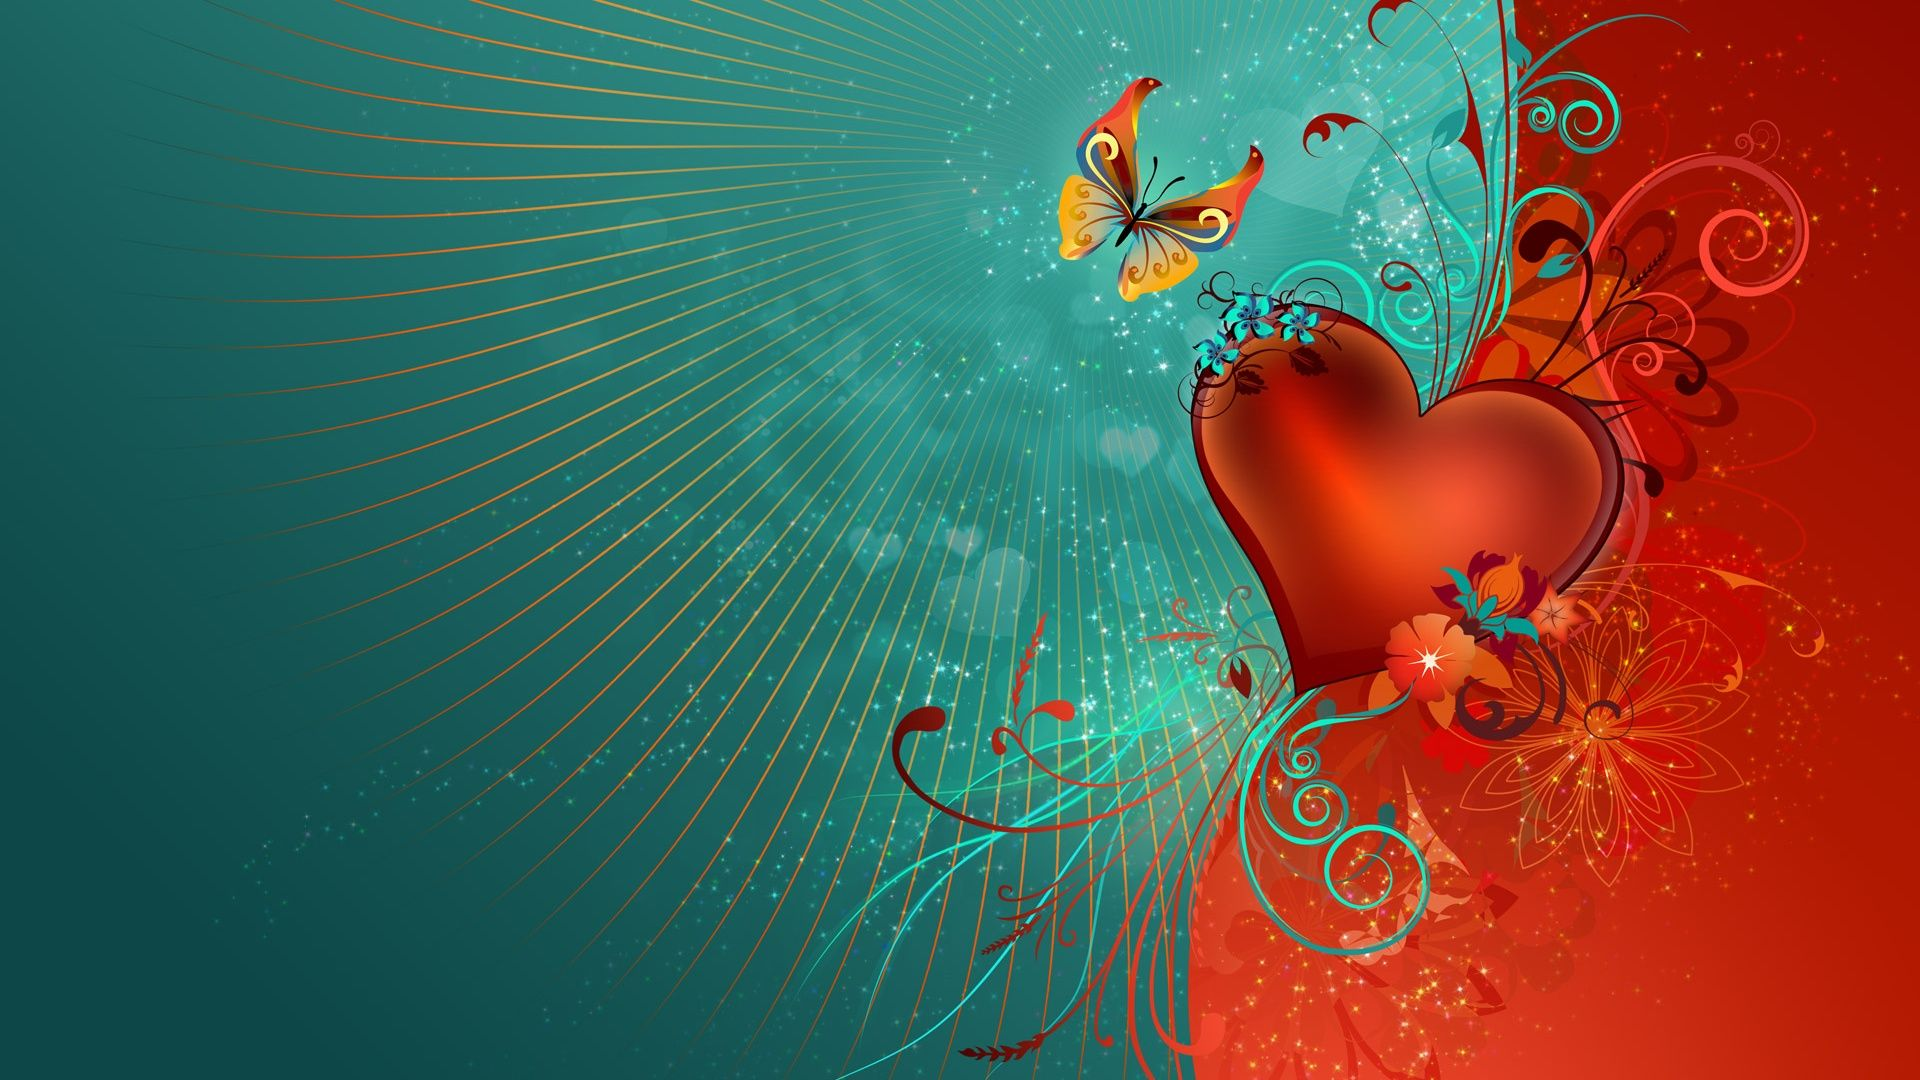 love wallpaper for desktop places to visit valentine background rh pinterest com